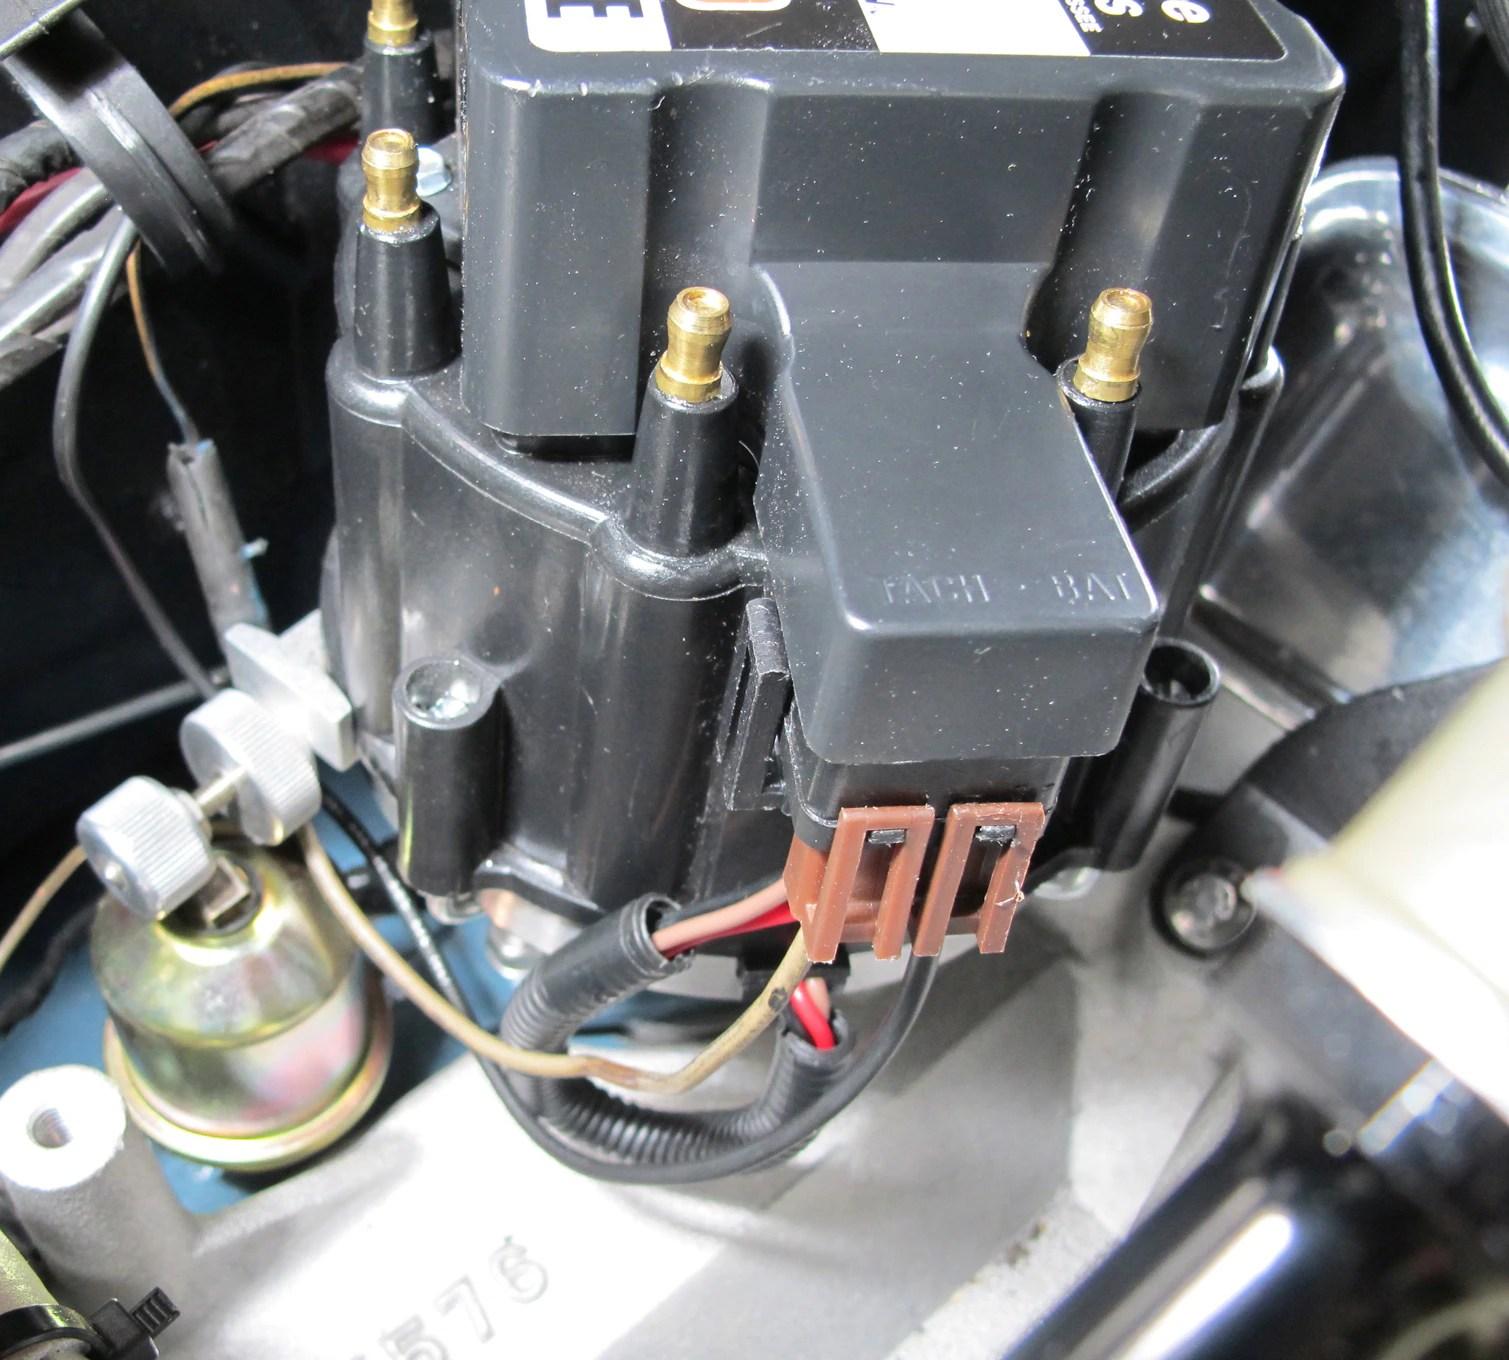 mopar hei wiring diagram help mopar electronic ignition installhei wiring harness hei image wiring diagram is [ 1509 x 1360 Pixel ]